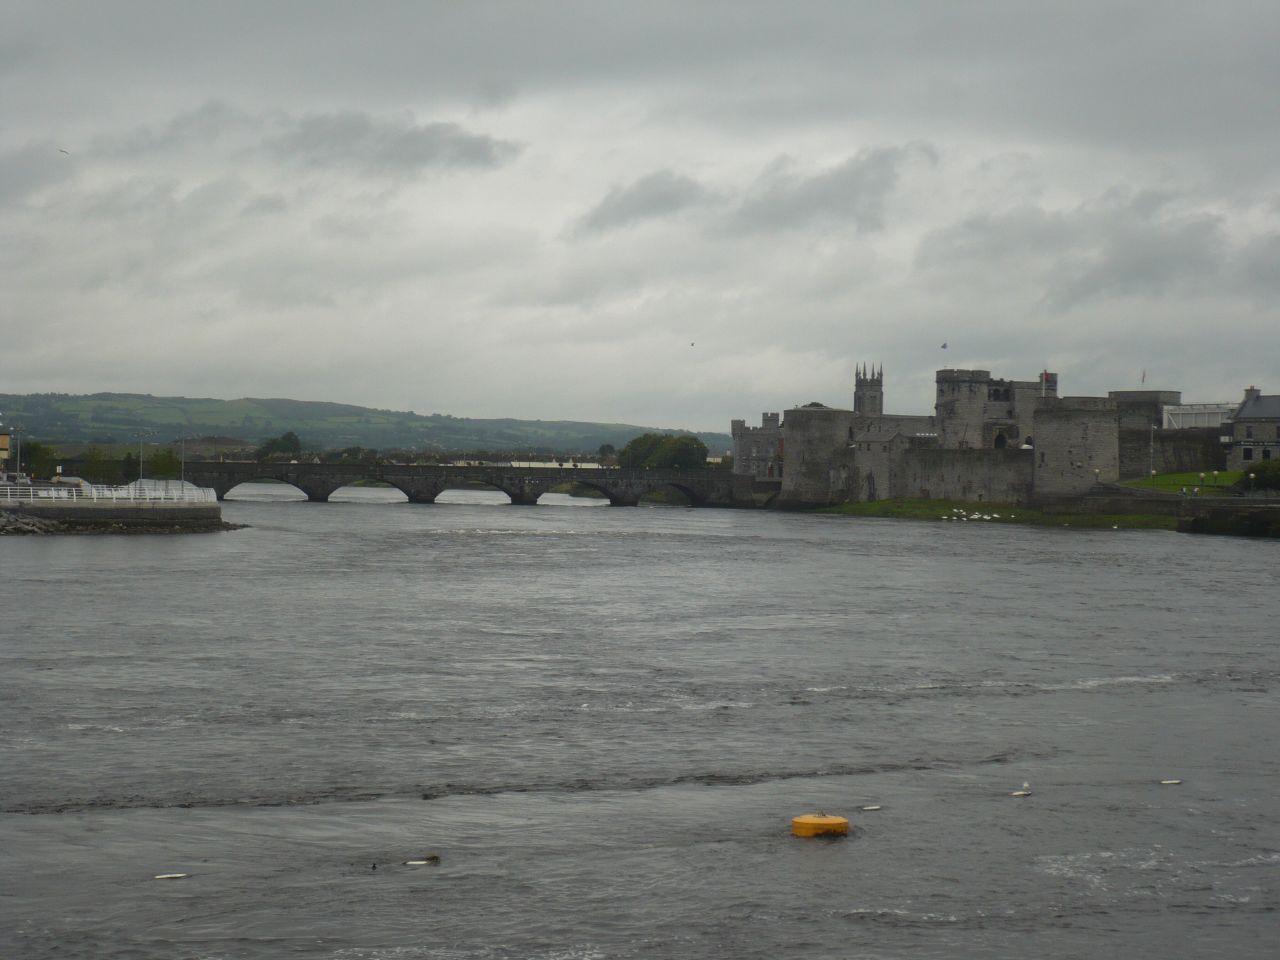 el castillo de Limerick